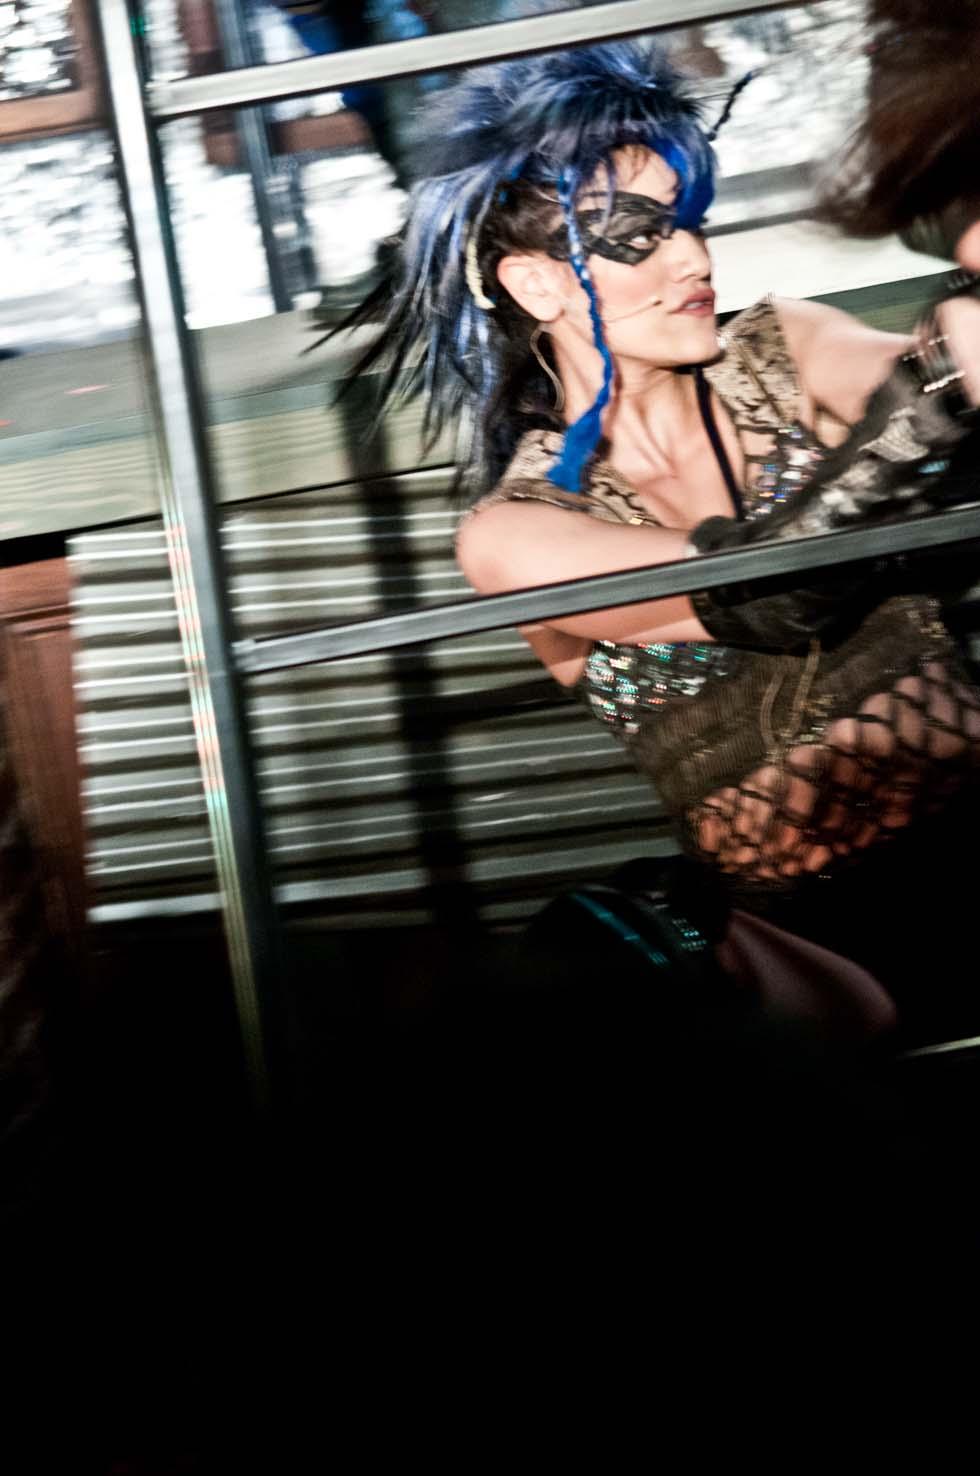 zum-schneider-nyc-2012-karneval-apocalyptika-3969.jpg